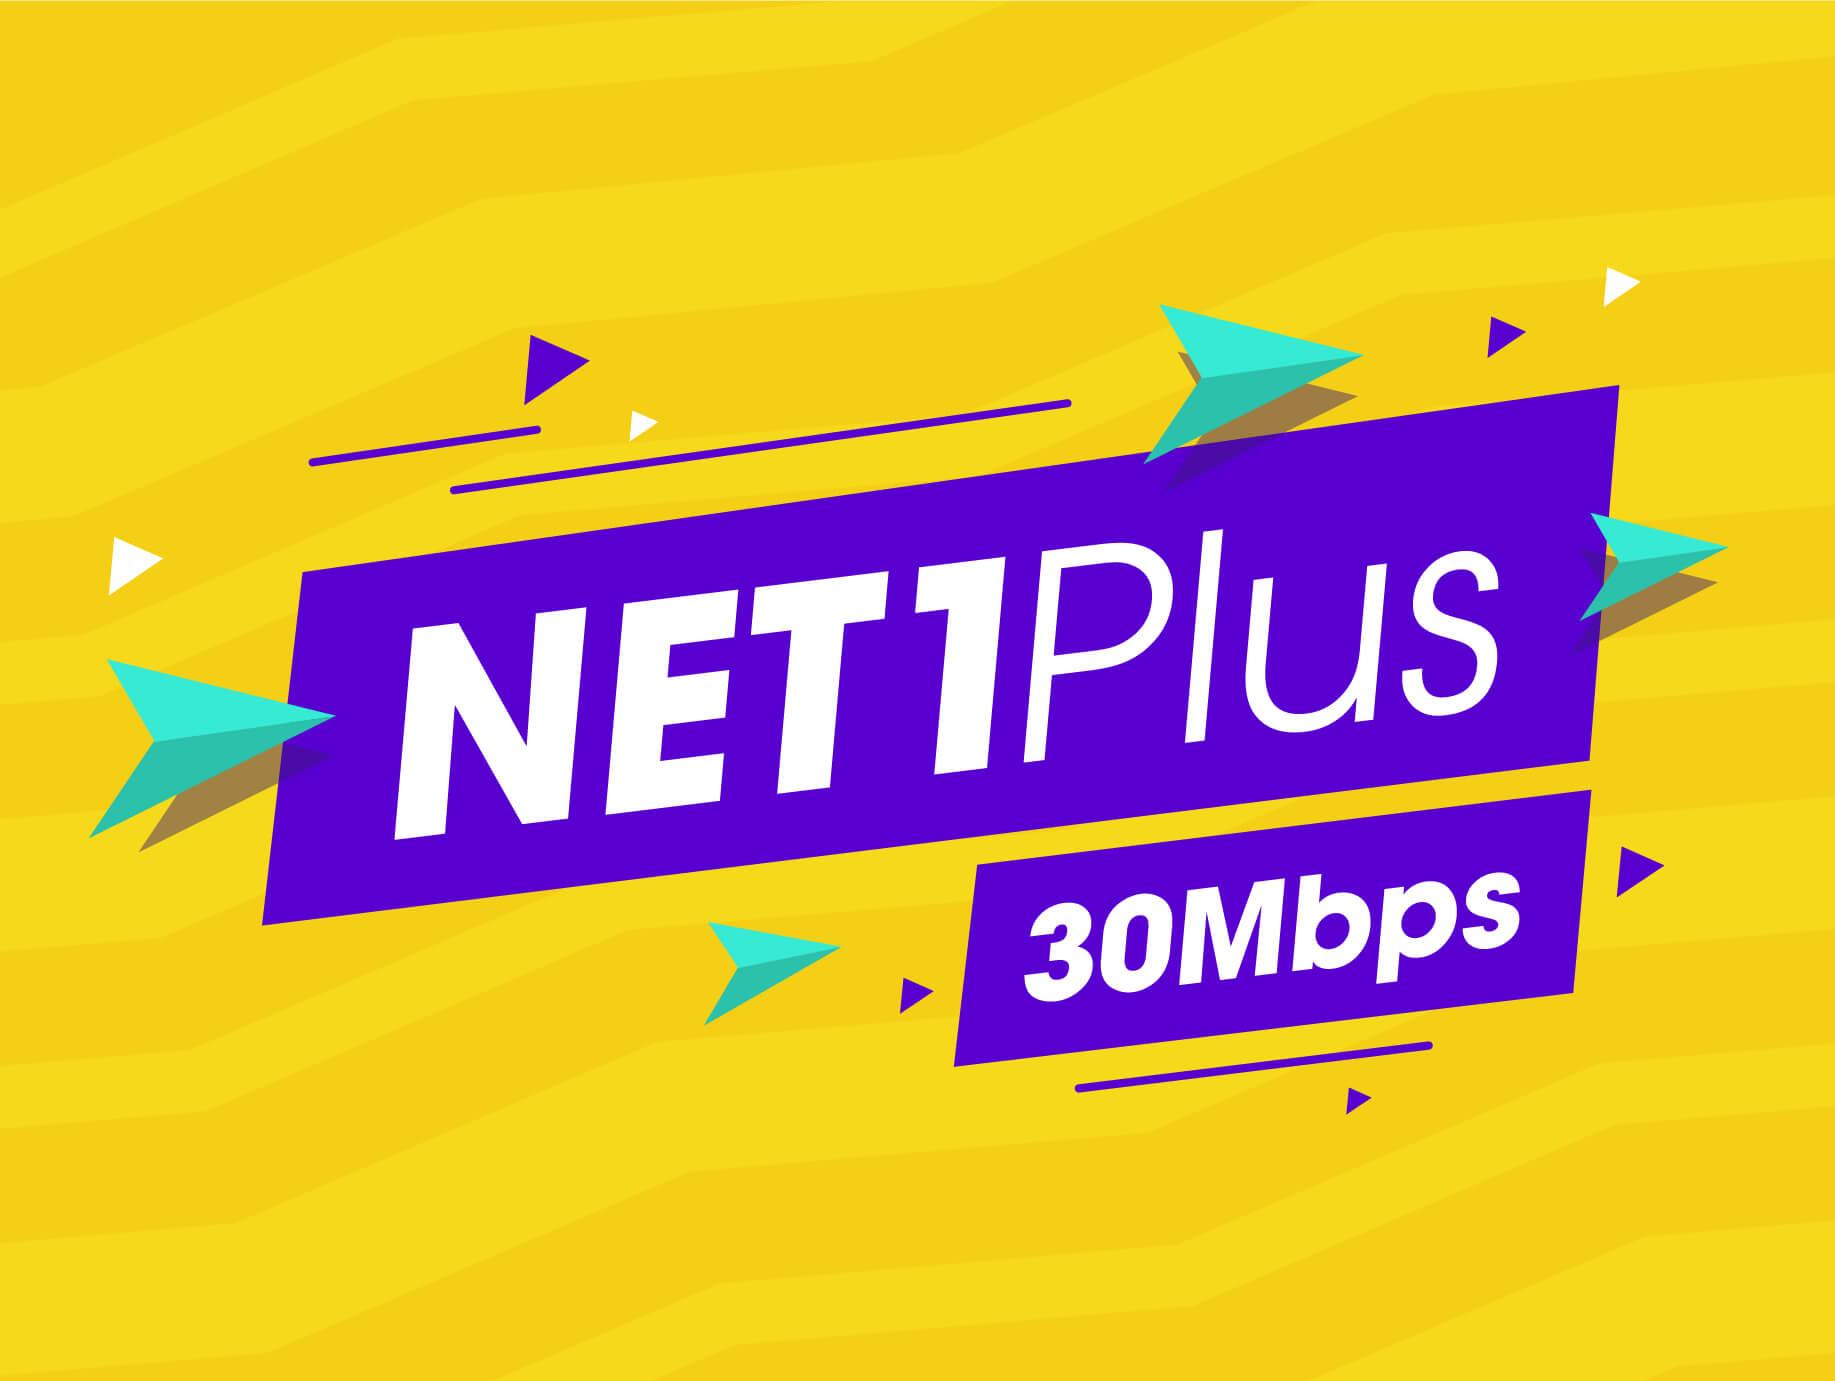 Internet Cáp Quang Wifi Gói Net 1 plus Viettel 30 Mbps